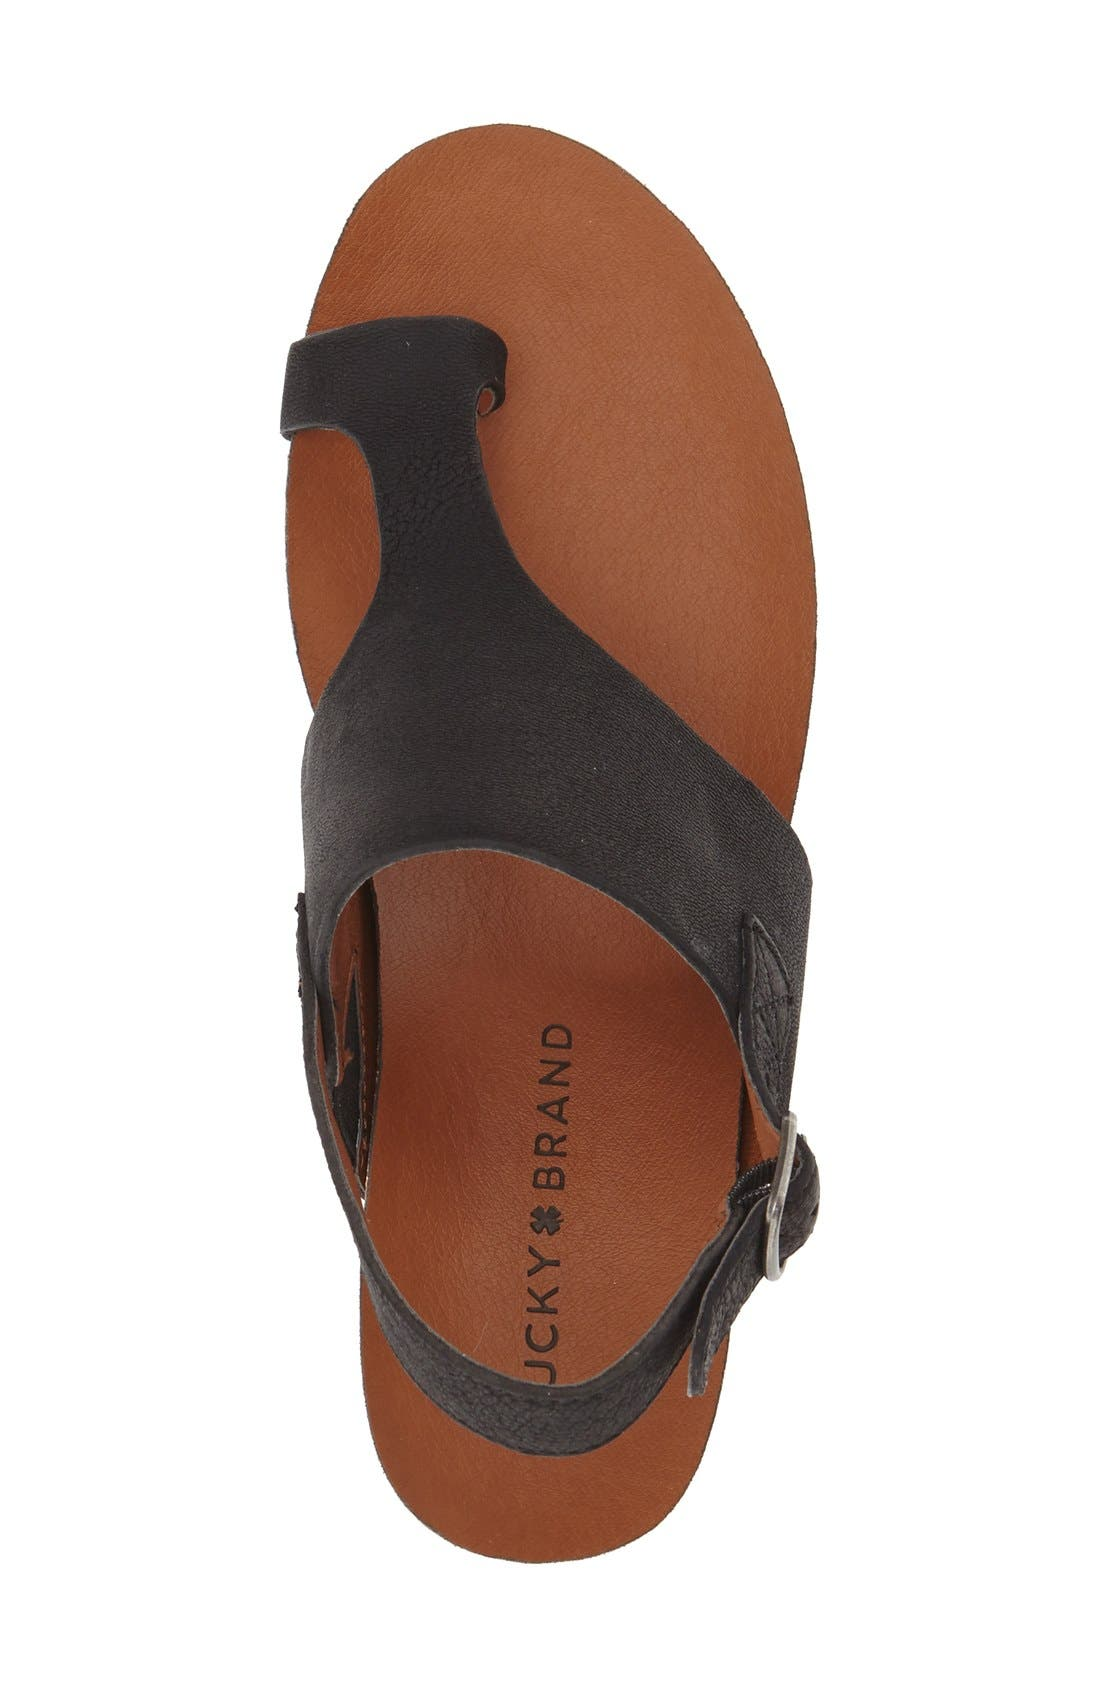 Alternate Image 3  - Lucky Brand 'Janessa' Espadrille Wedge Sandal (Women)